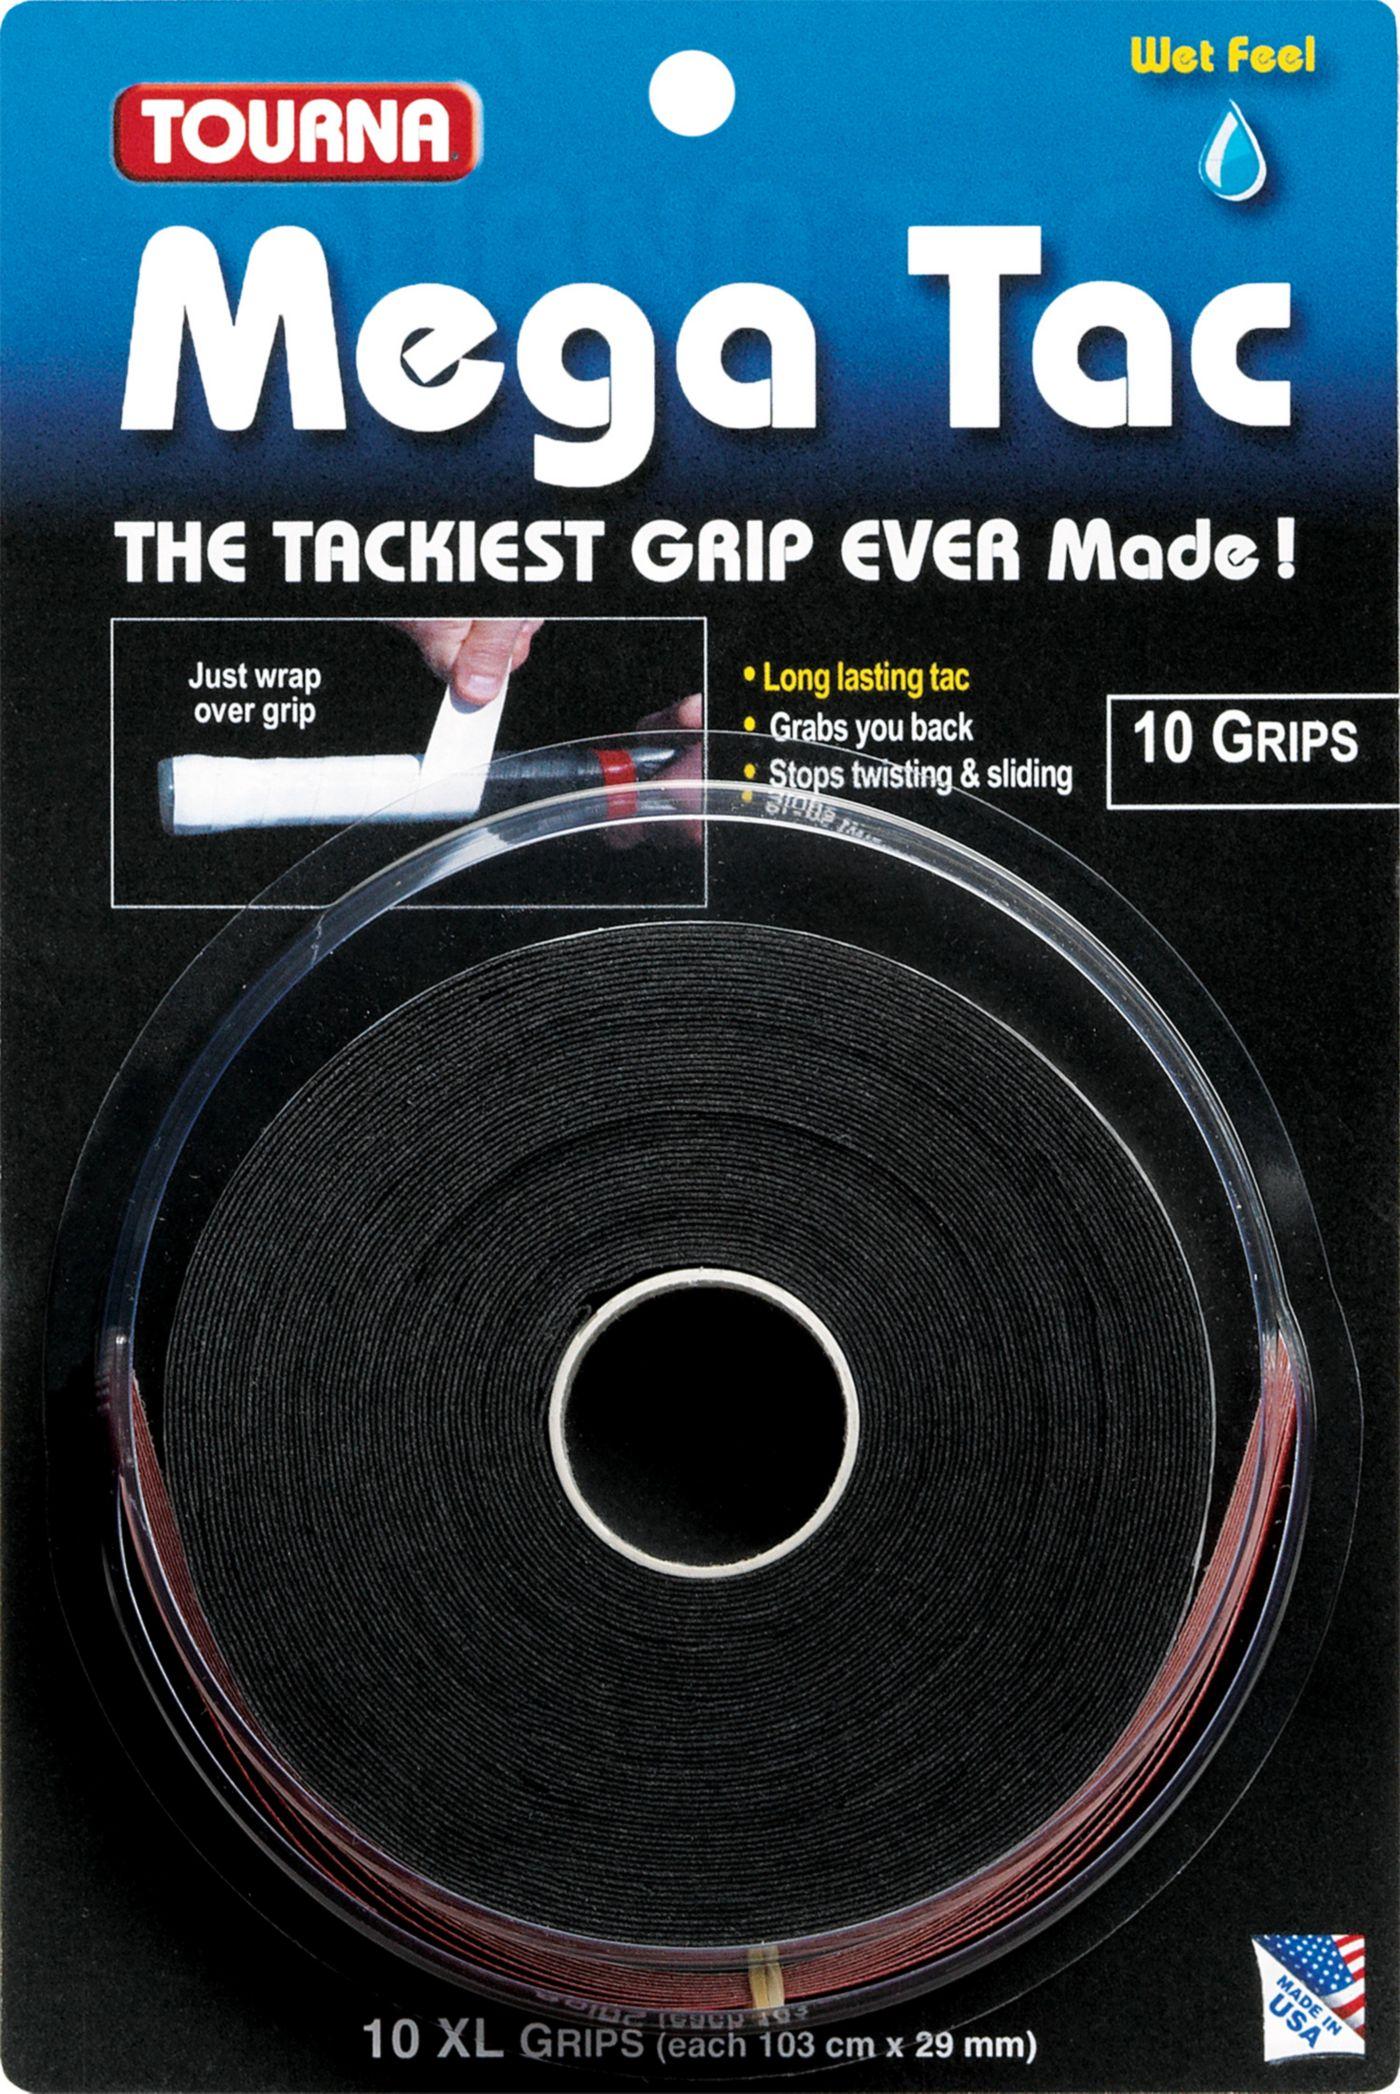 Tourna Mega Tac Overgrip - 10 Pack